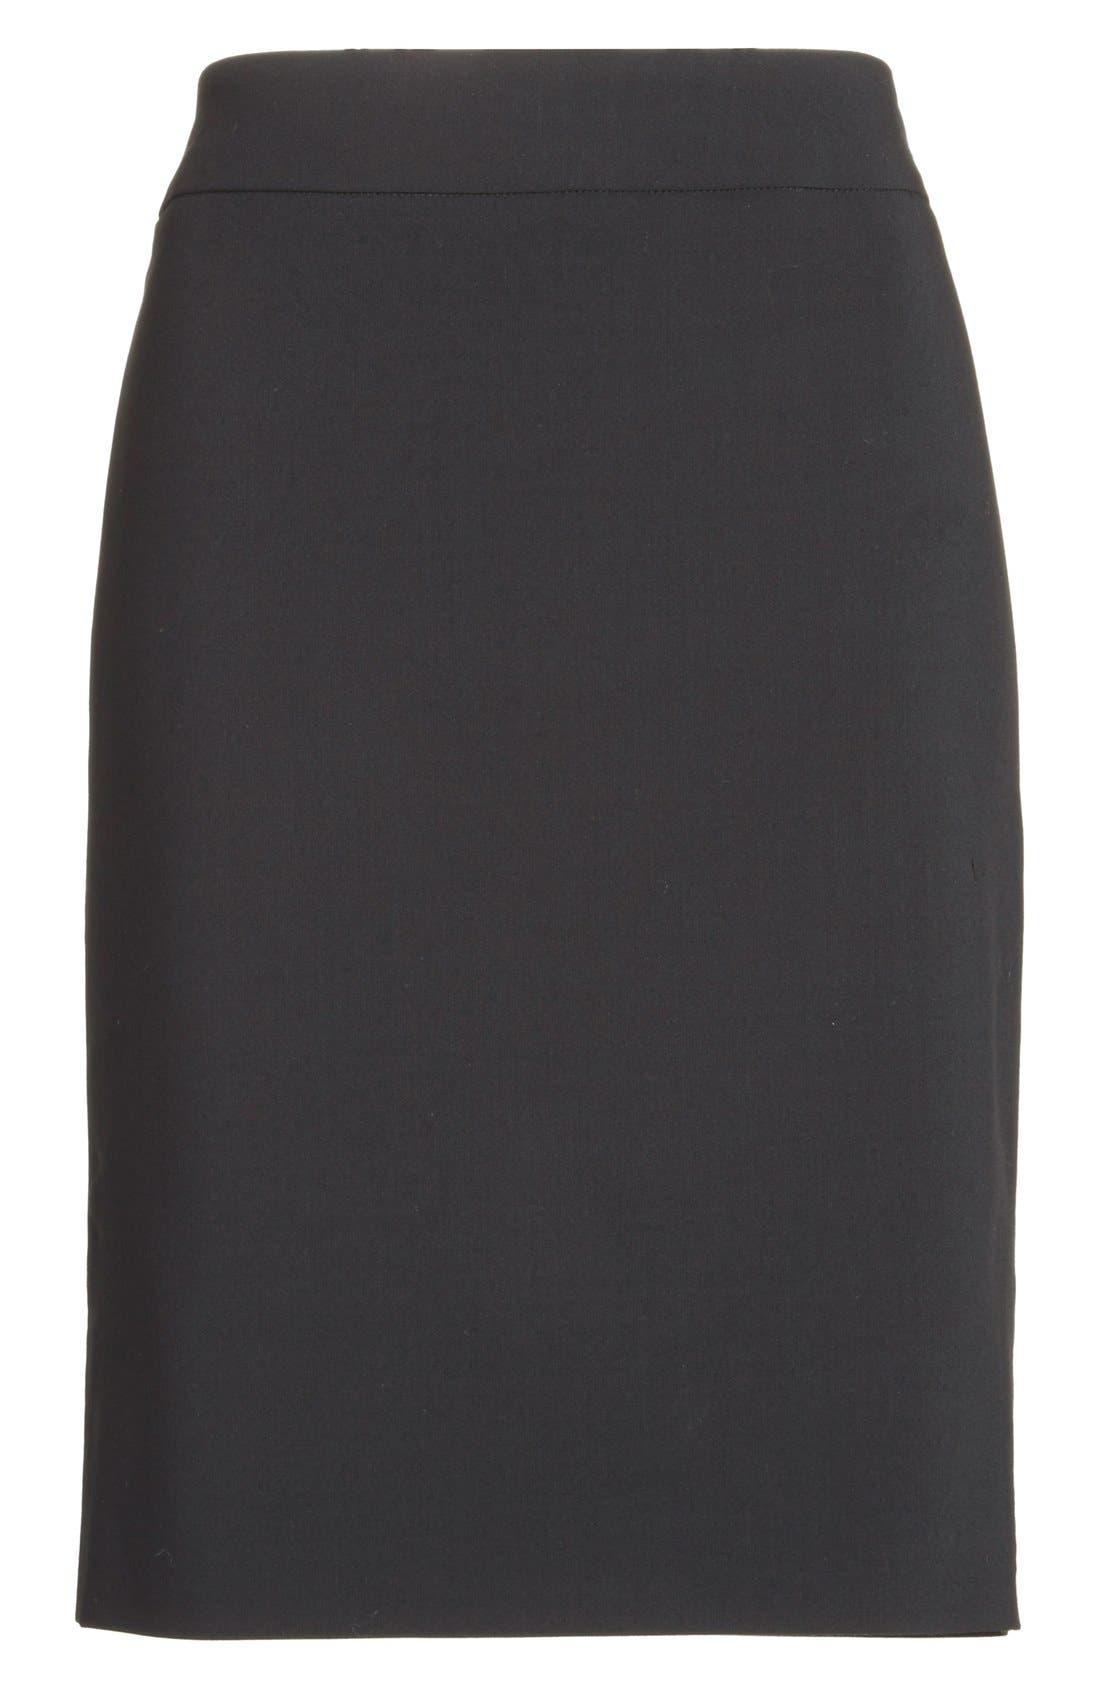 Alternate Image 4  - Armani Collezioni Featherweight Wool Pencil Skirt